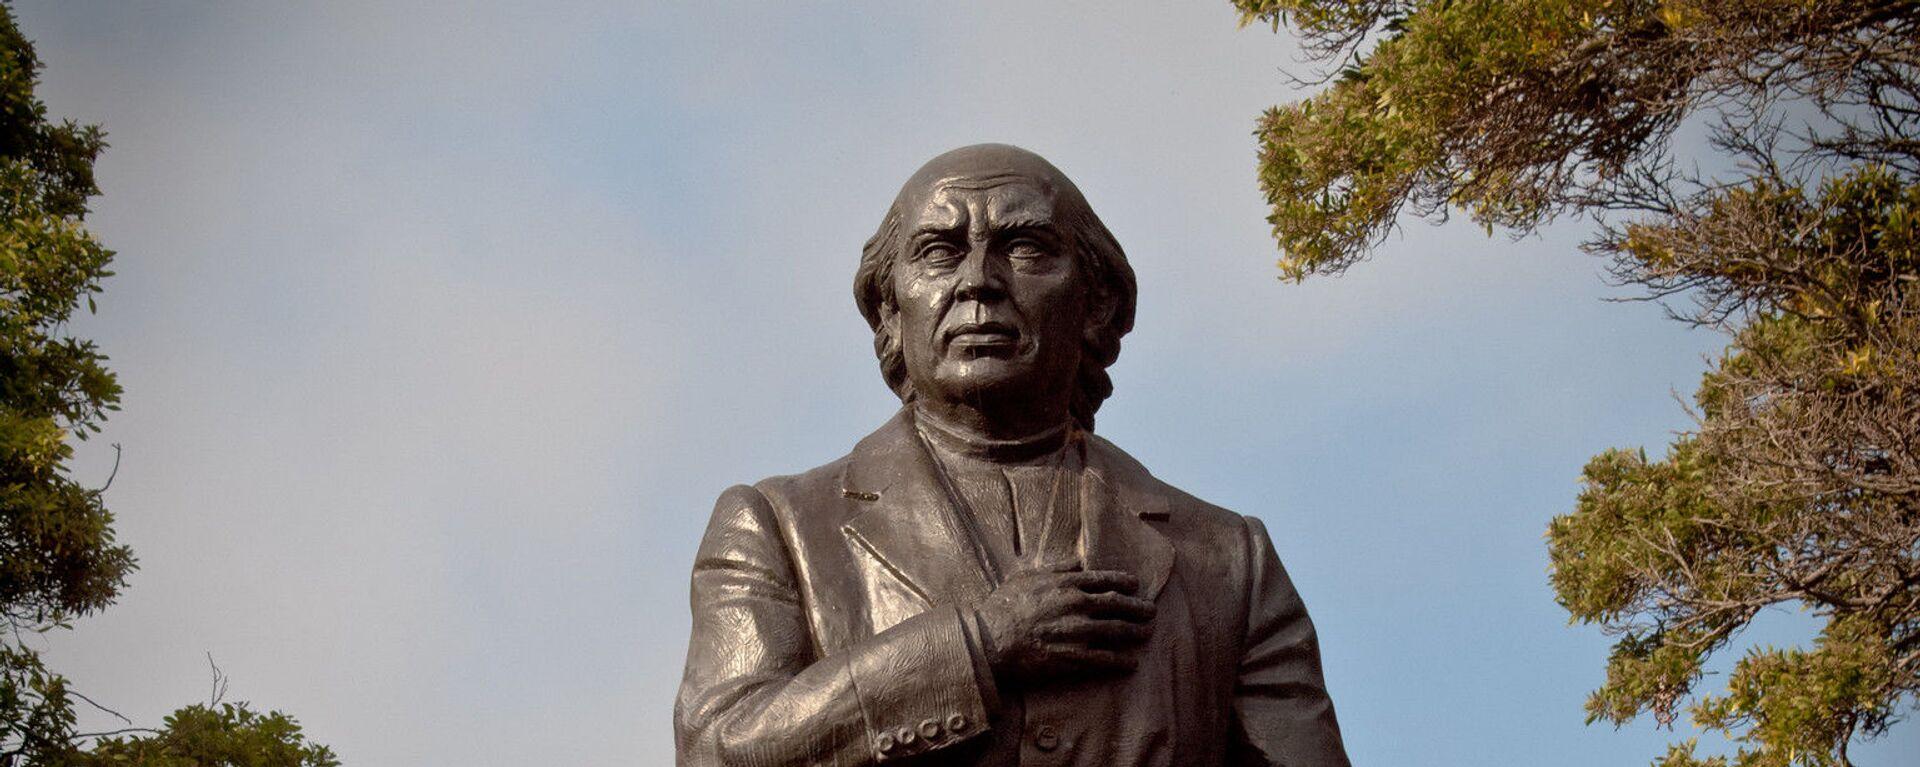 Monumento a Miguel Hidalgo - Sputnik Mundo, 1920, 15.09.2020